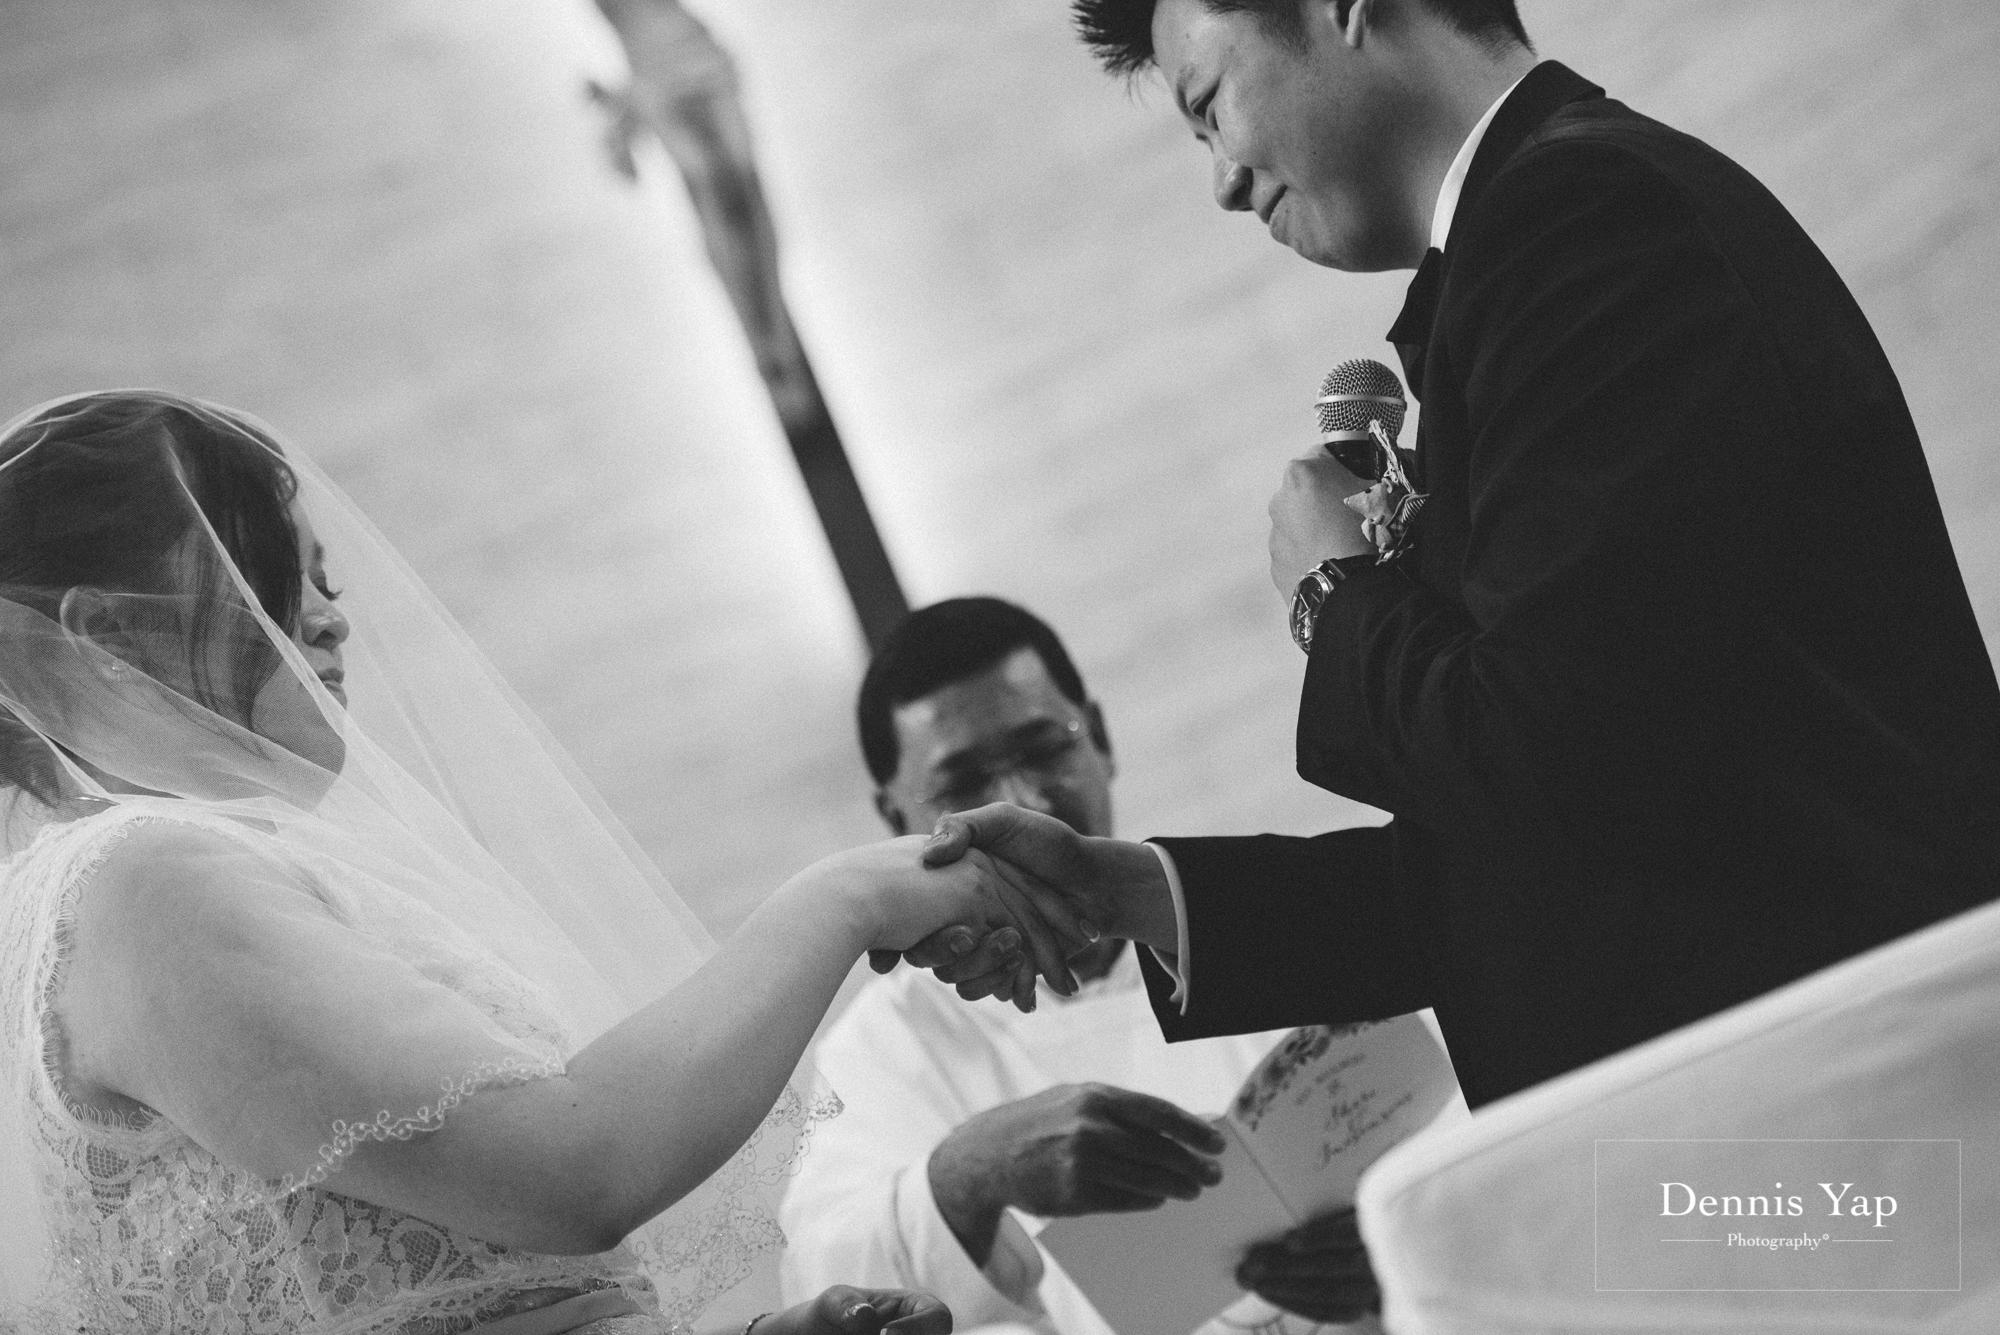 ino sheri black white church wedding st thomas more subang jaya dennis yap photography touching love beloved australia indonesia-28.jpg